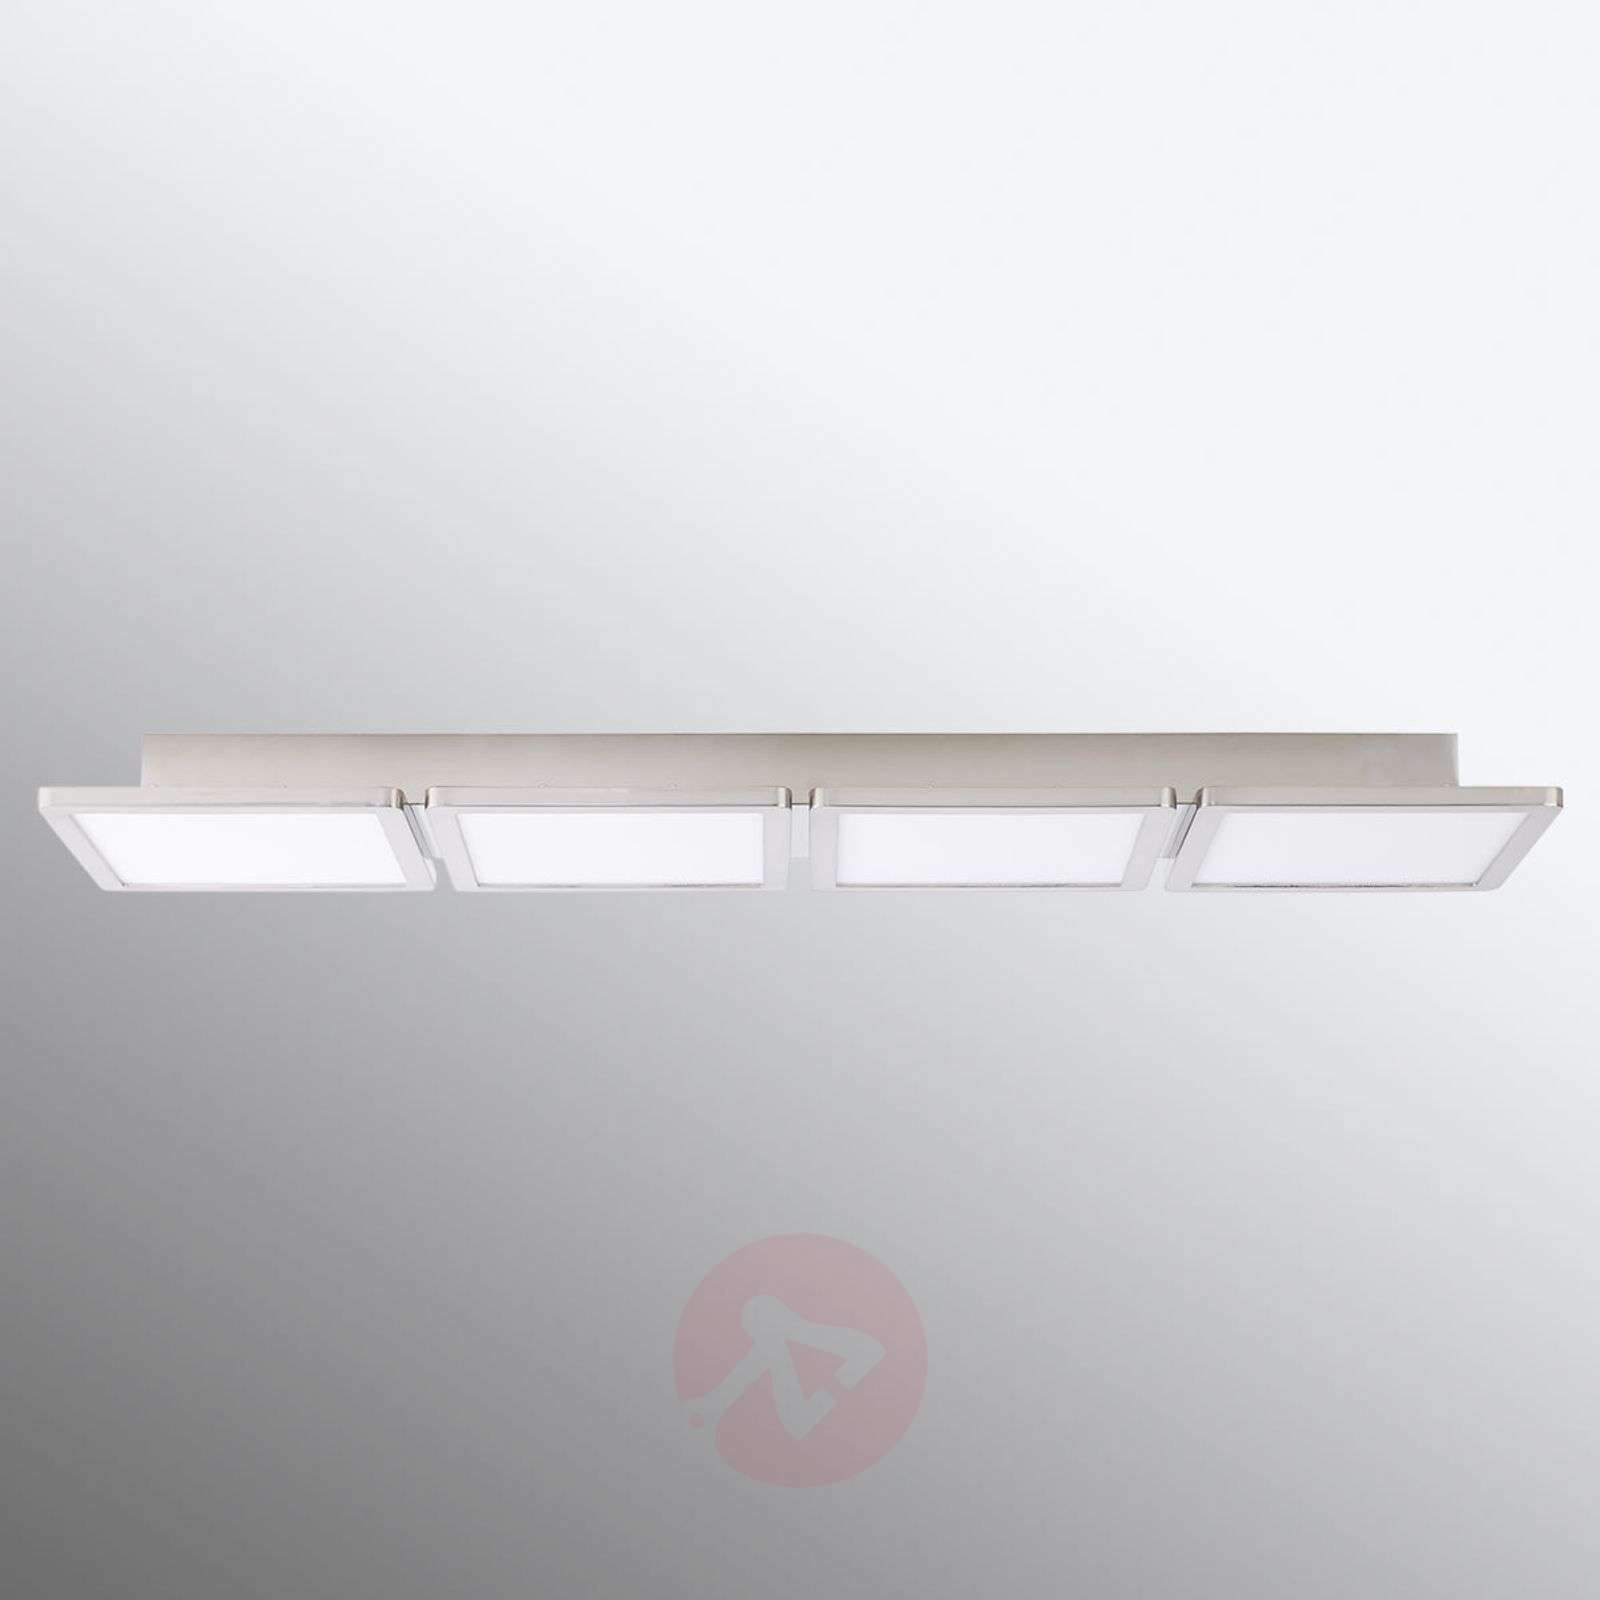 Nelios. Easydim-kattovalaisin Scope LED-valoilla-1509243-01